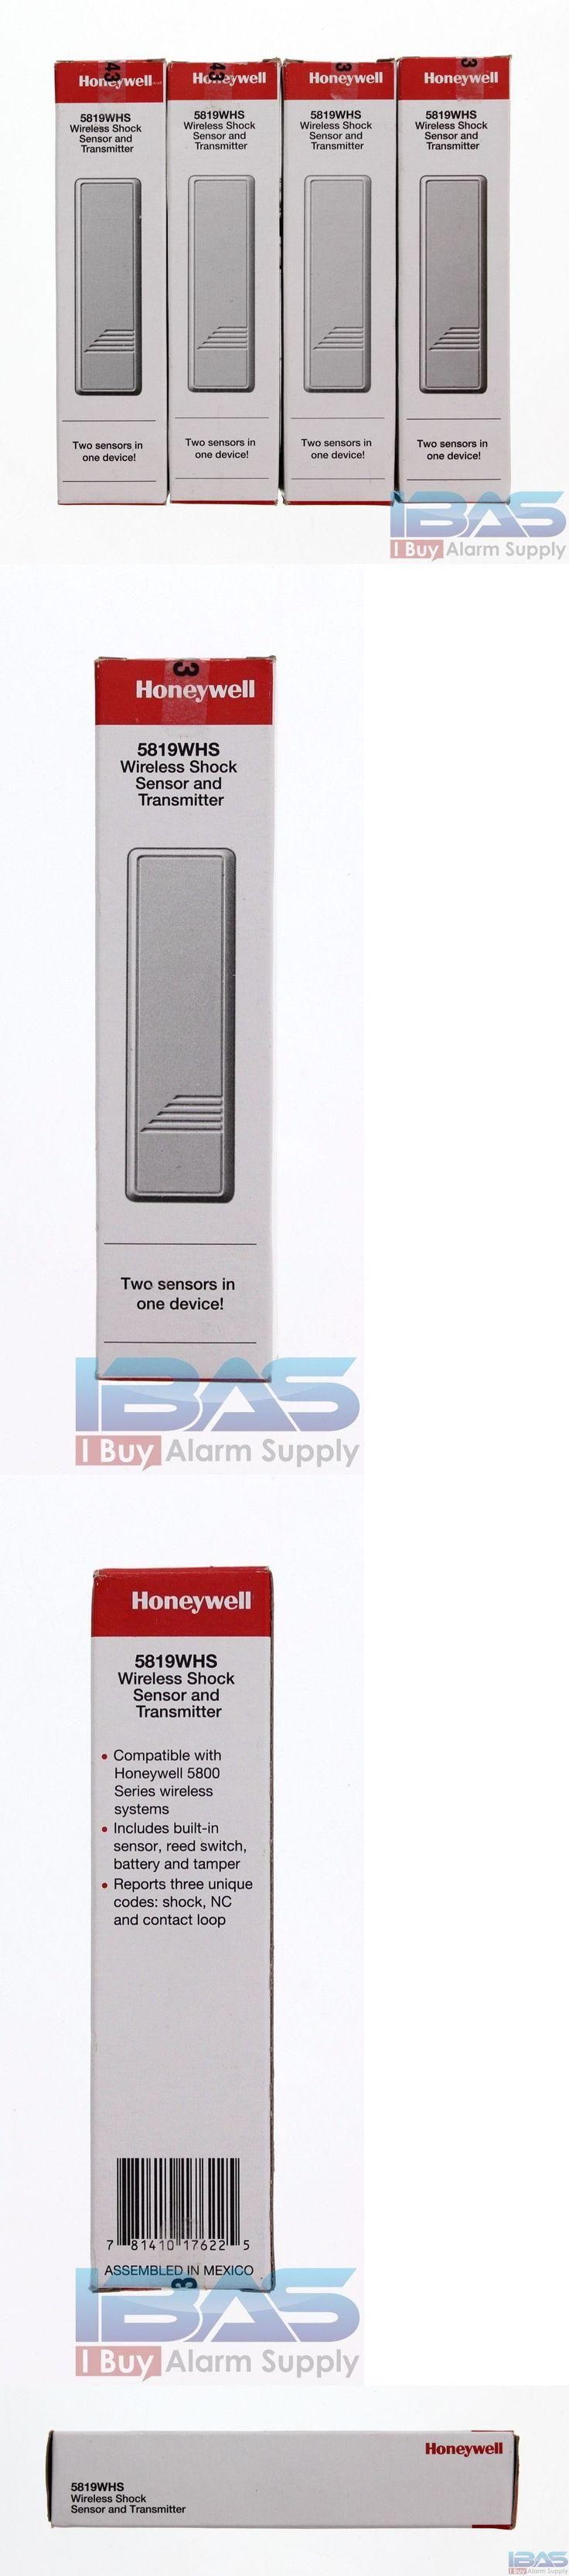 Wireless Transmitters 115946: 4 Honeywell Ademco Adt 5819Whs Wireless Door Shock Sensor Alarm System Contact -> BUY IT NOW ONLY: $175.99 on eBay!